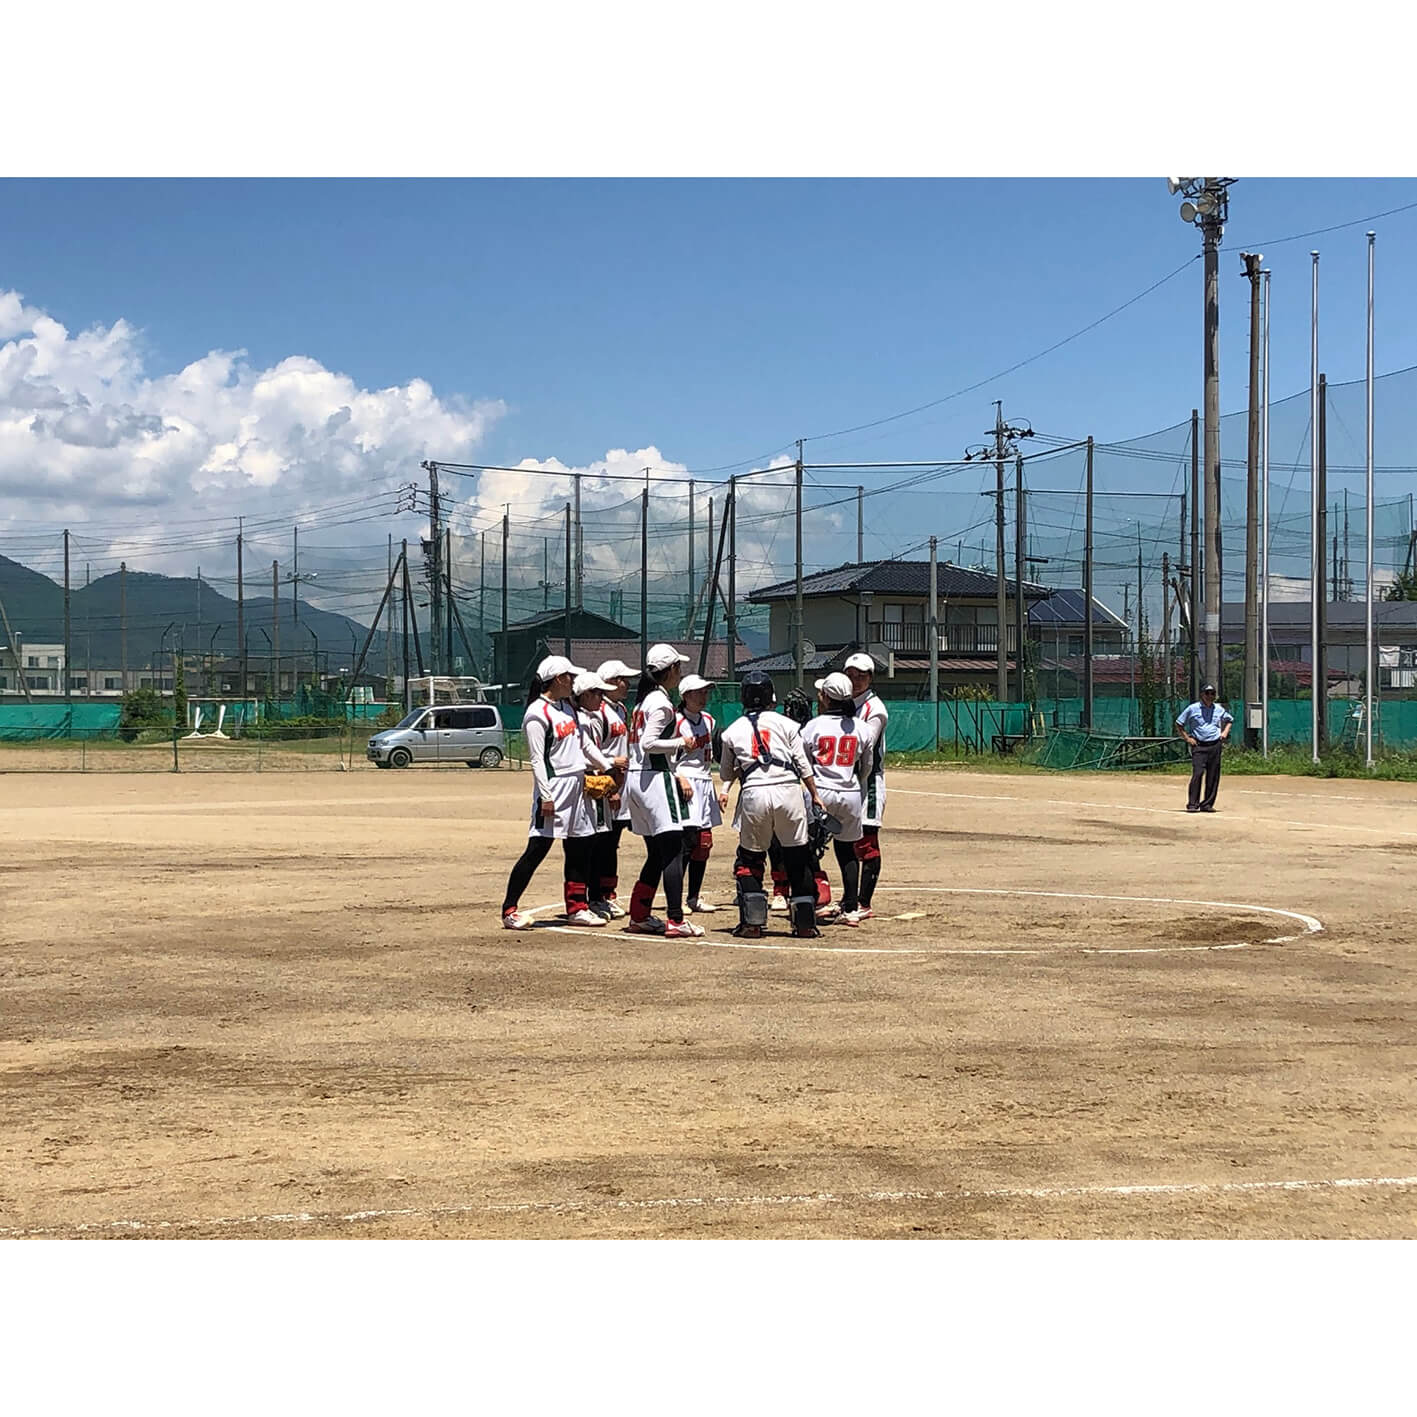 長野県下諏訪向陽高等学校 ソフトボール部